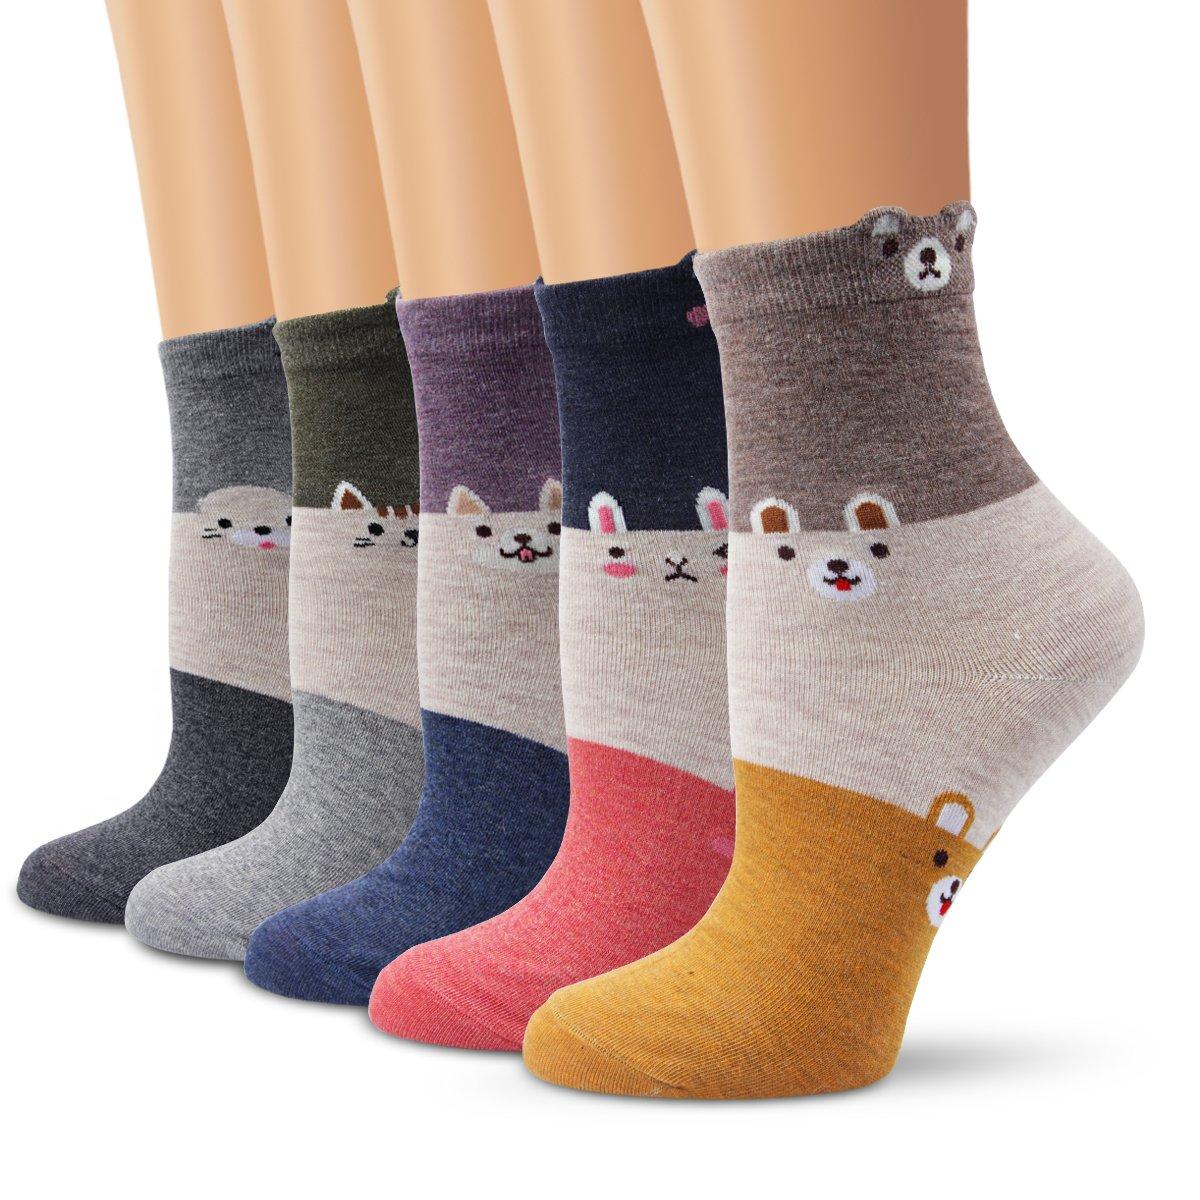 Ambielly Cotton Socks Thermal Socks Adult Unisex Socks SD-T00706